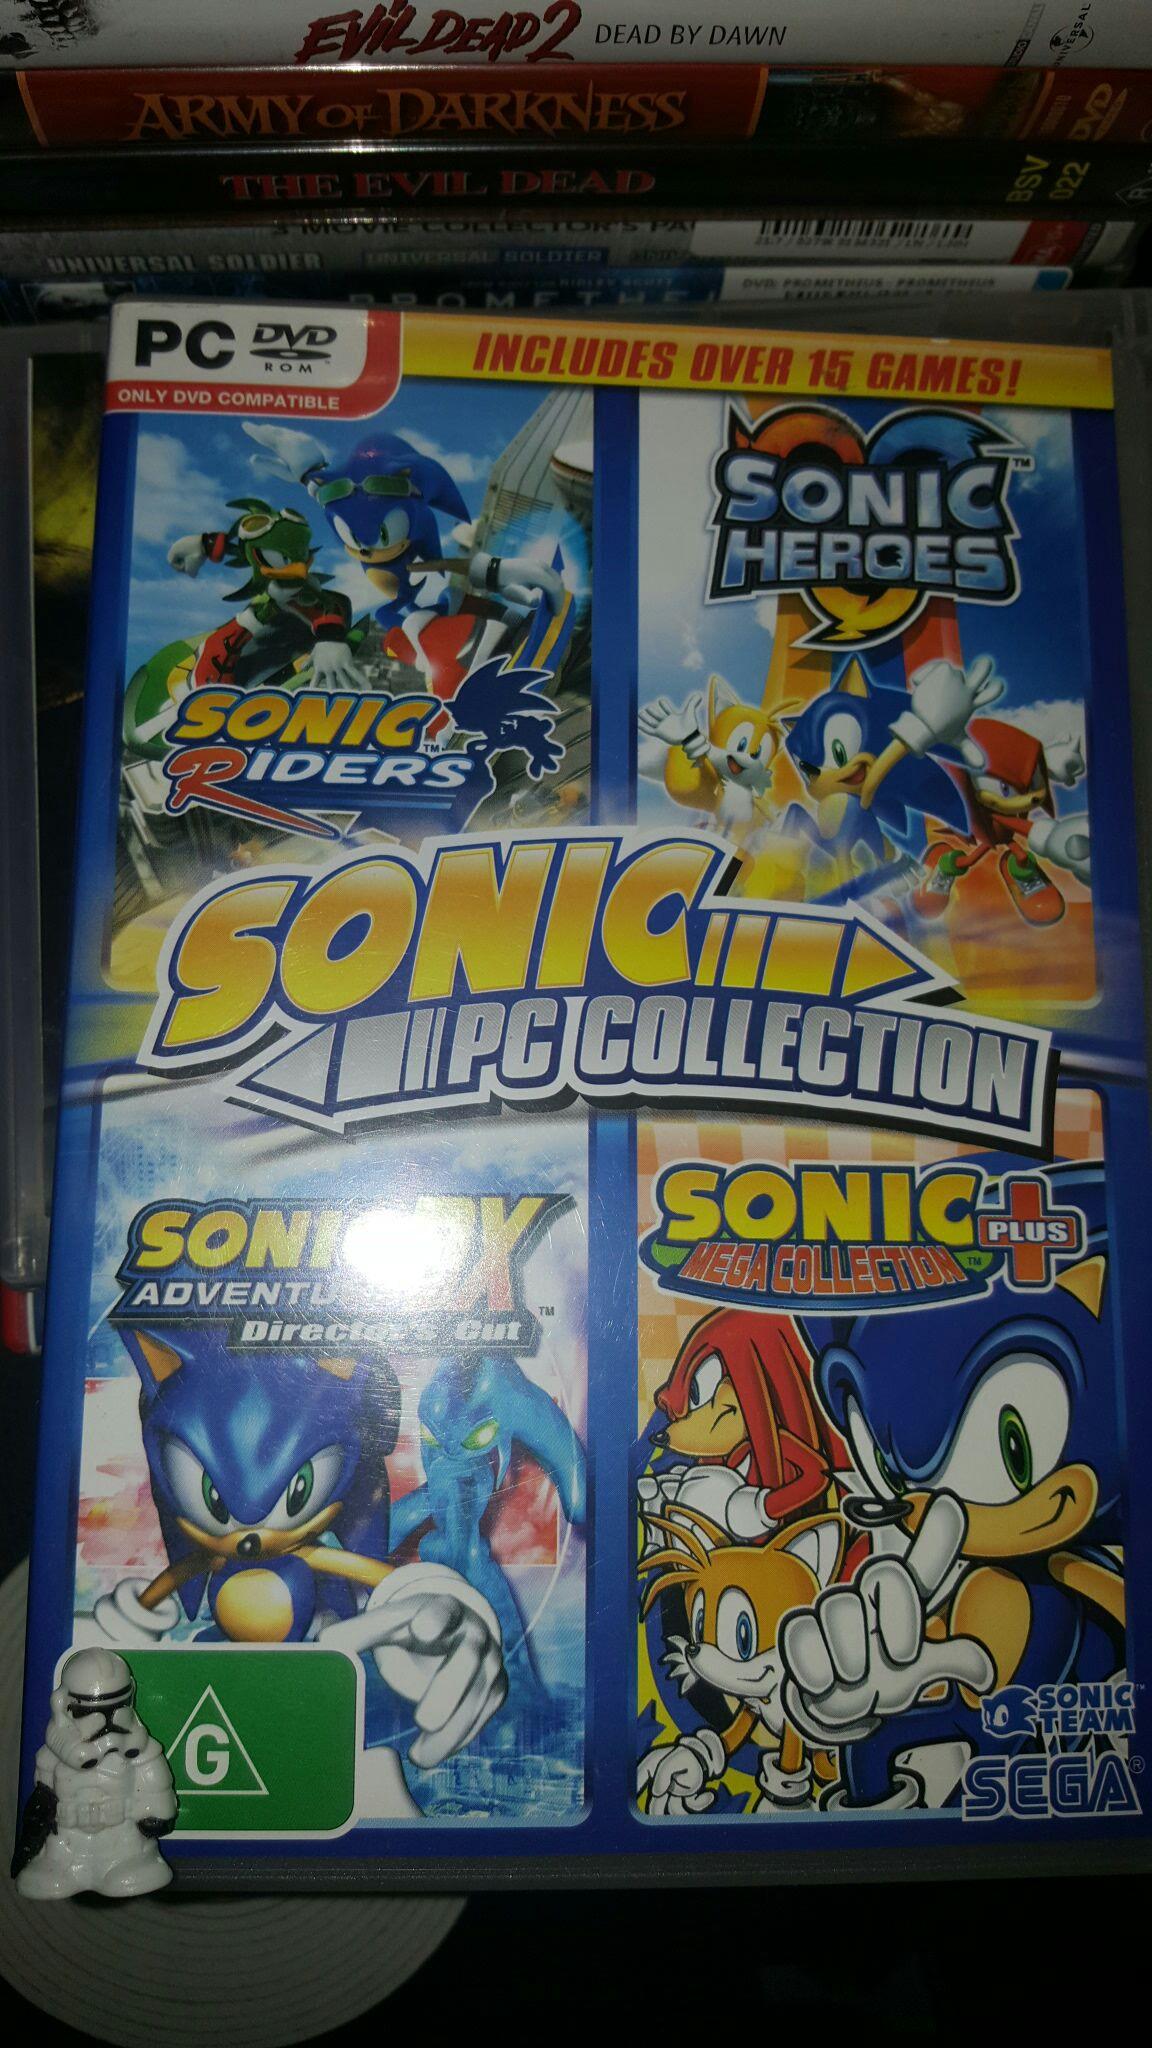 Sonic Mega Collection Plus - PC cover